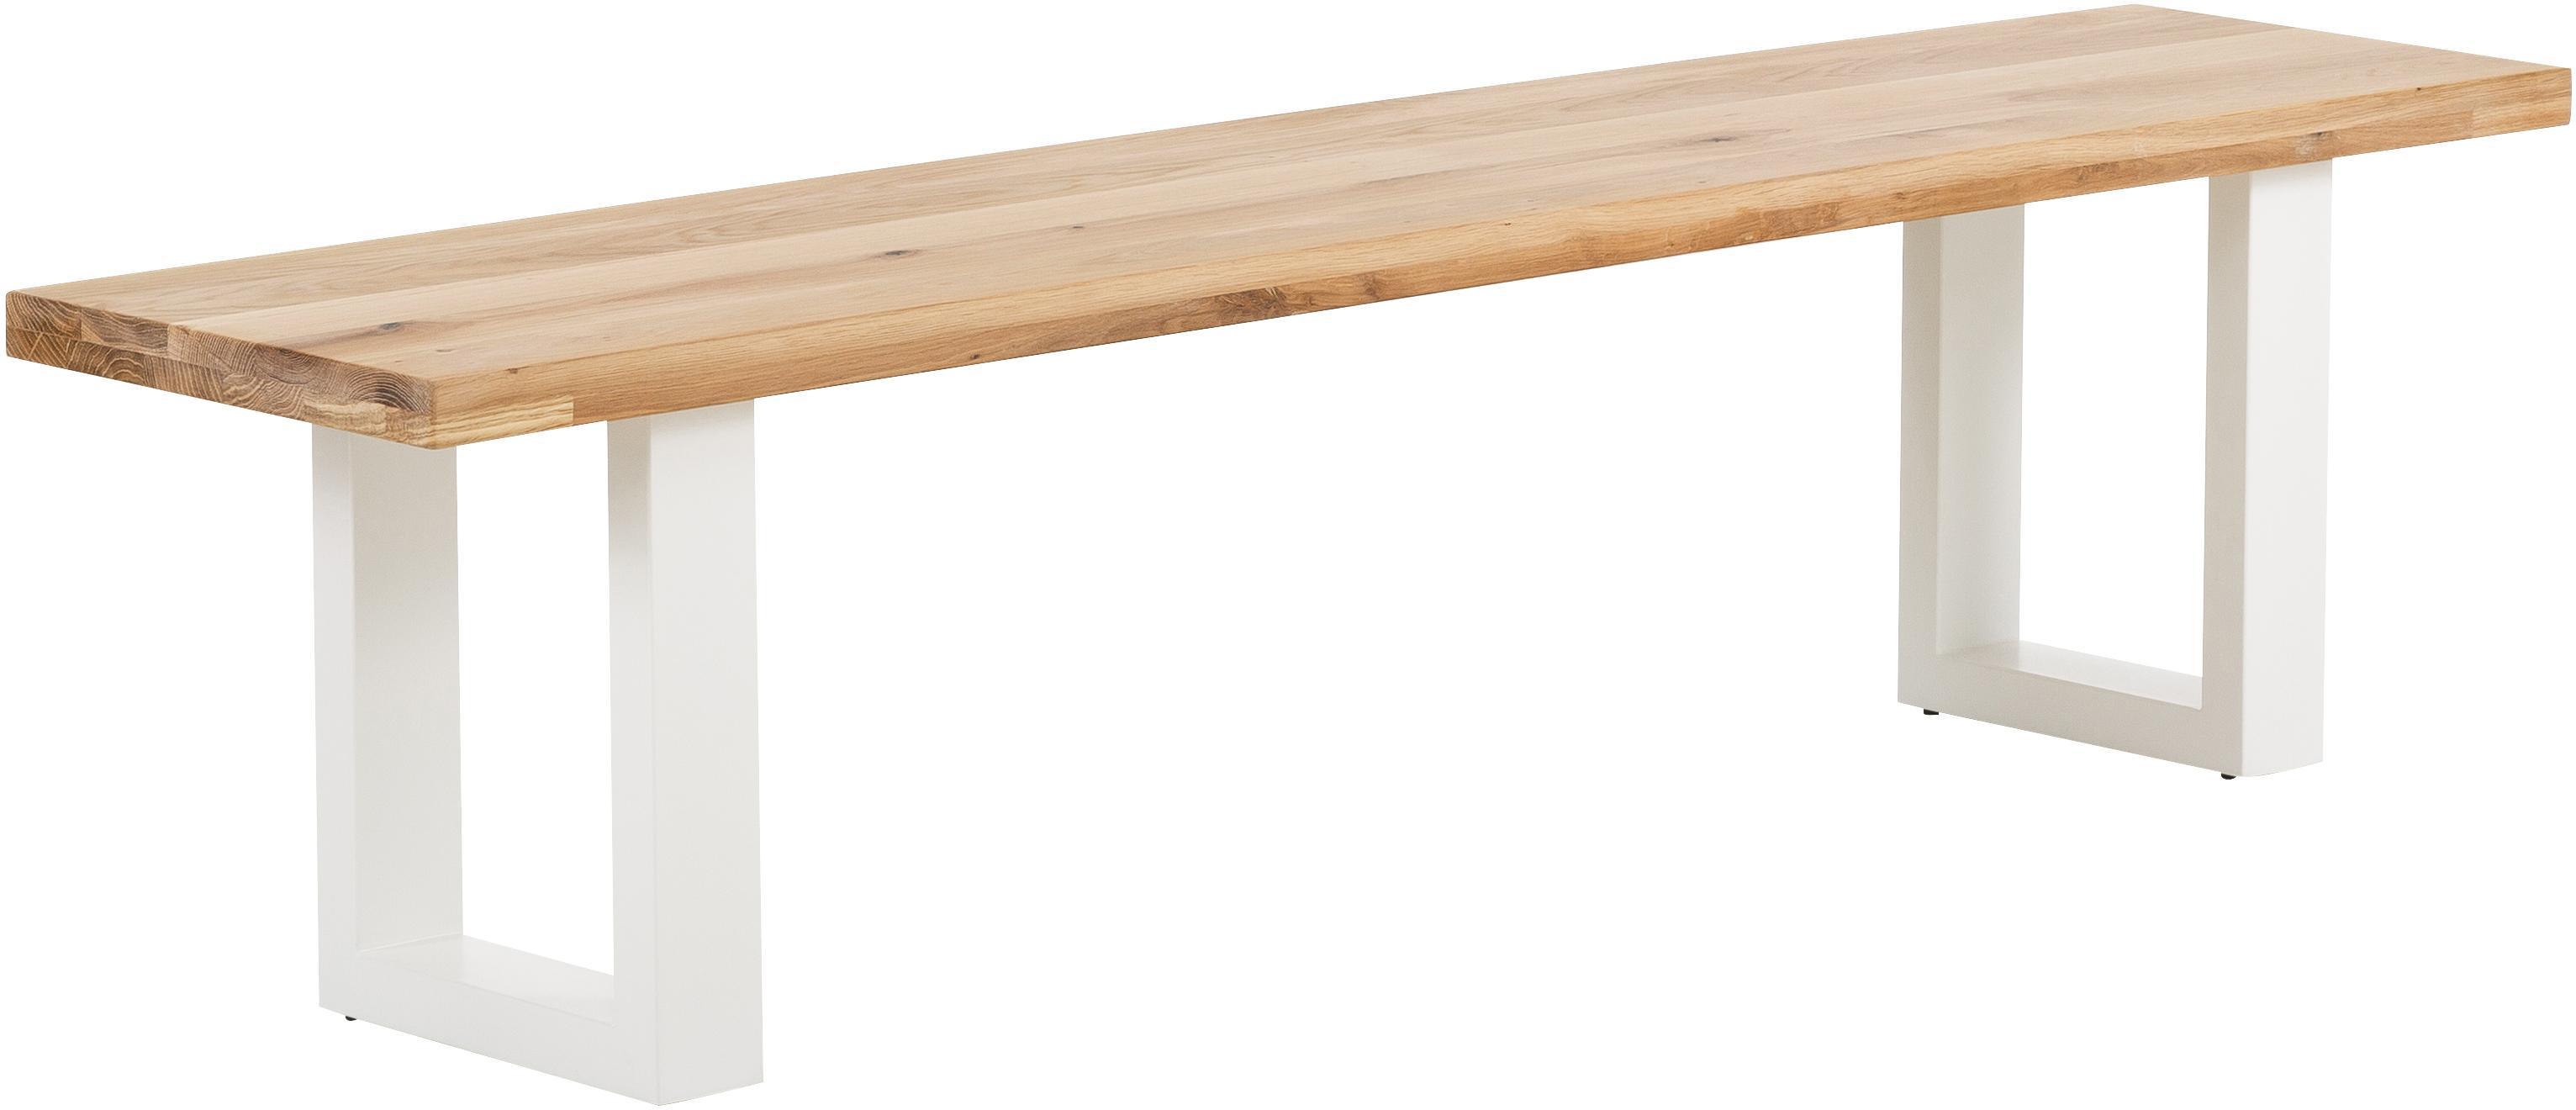 Banco de madera maciza Oliver, Asiento: madera de roble silvestre, Patas: acero mate lacado, Roble, blanco, An 180 x Al 45 cm